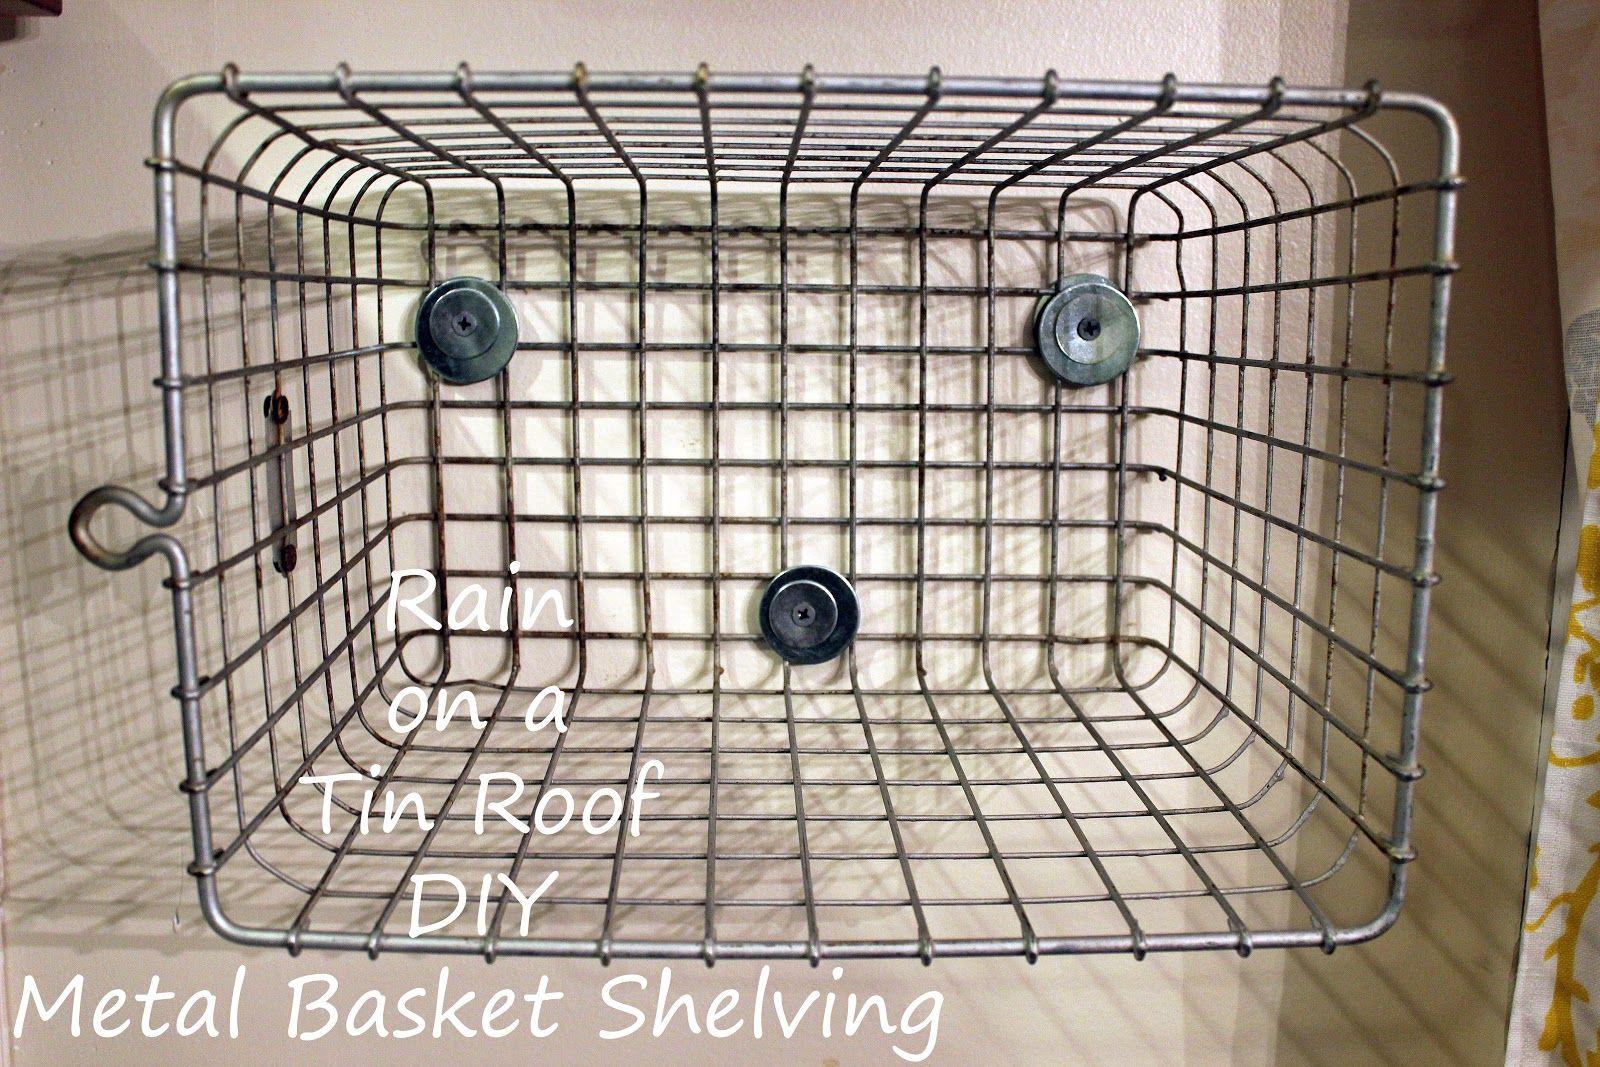 Mounting+Locker+Baskets+to+the+Wall.JPG 1600×1067 pixels